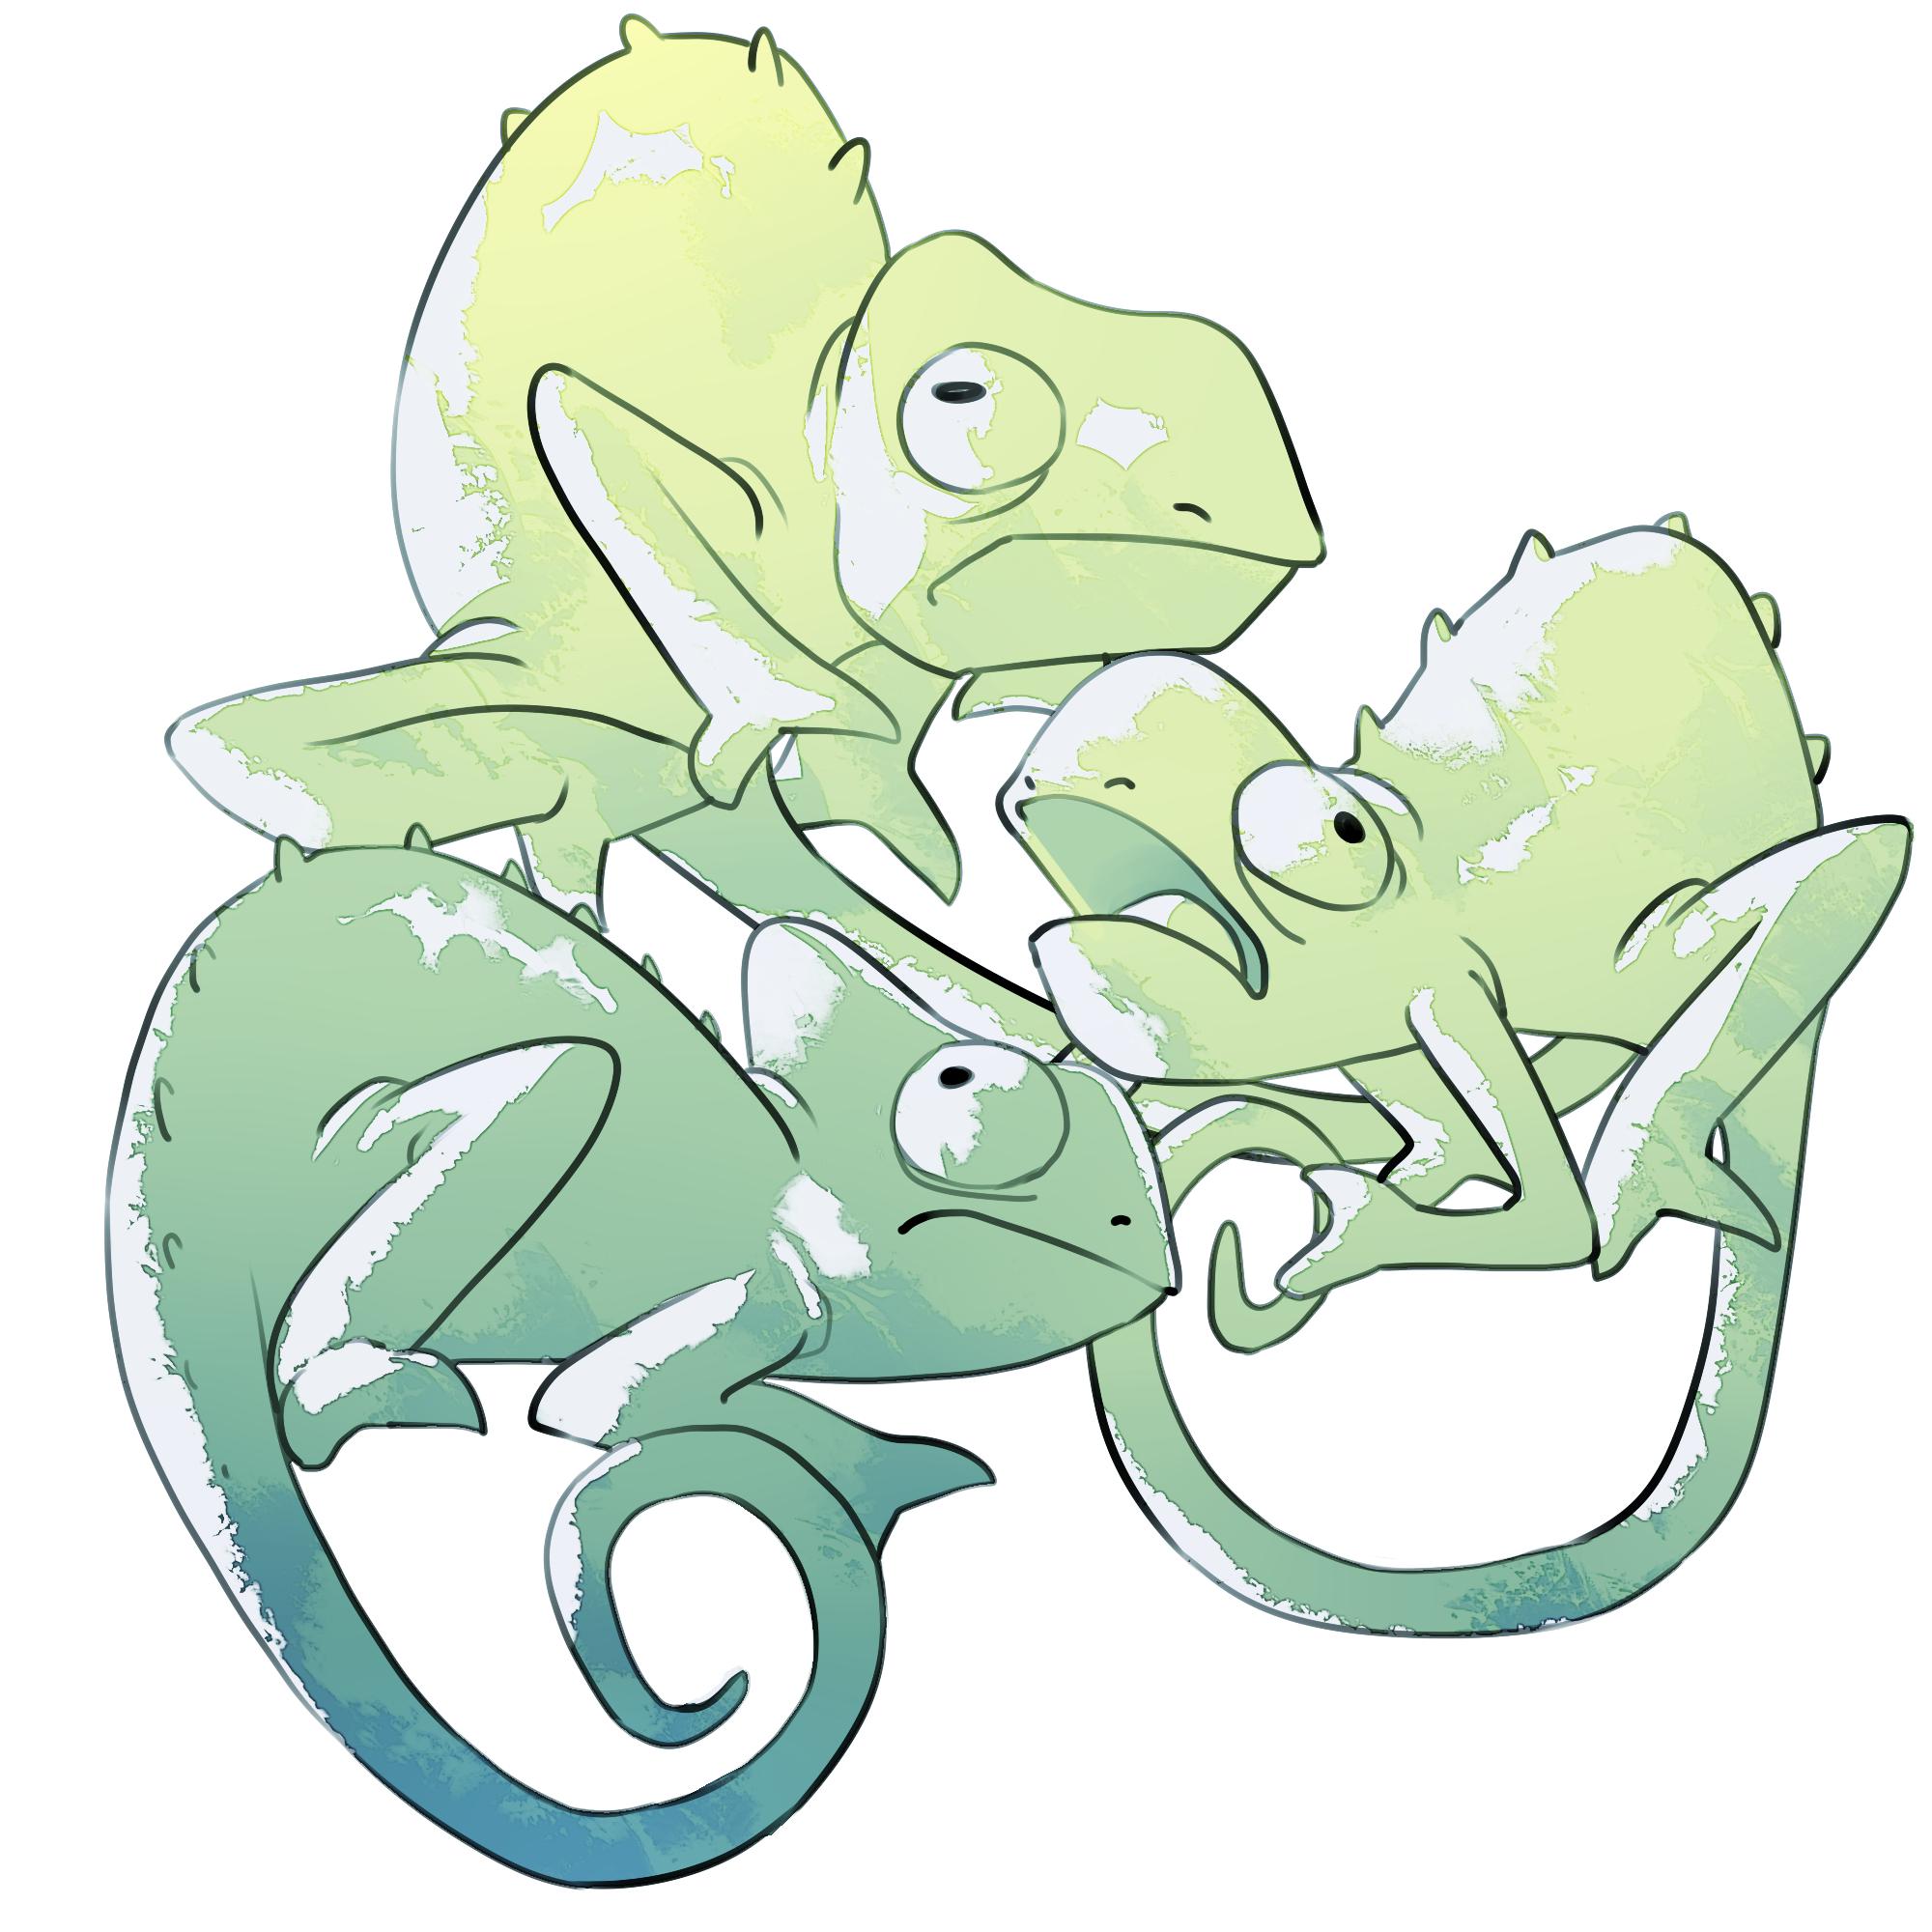 Chameleons1.png